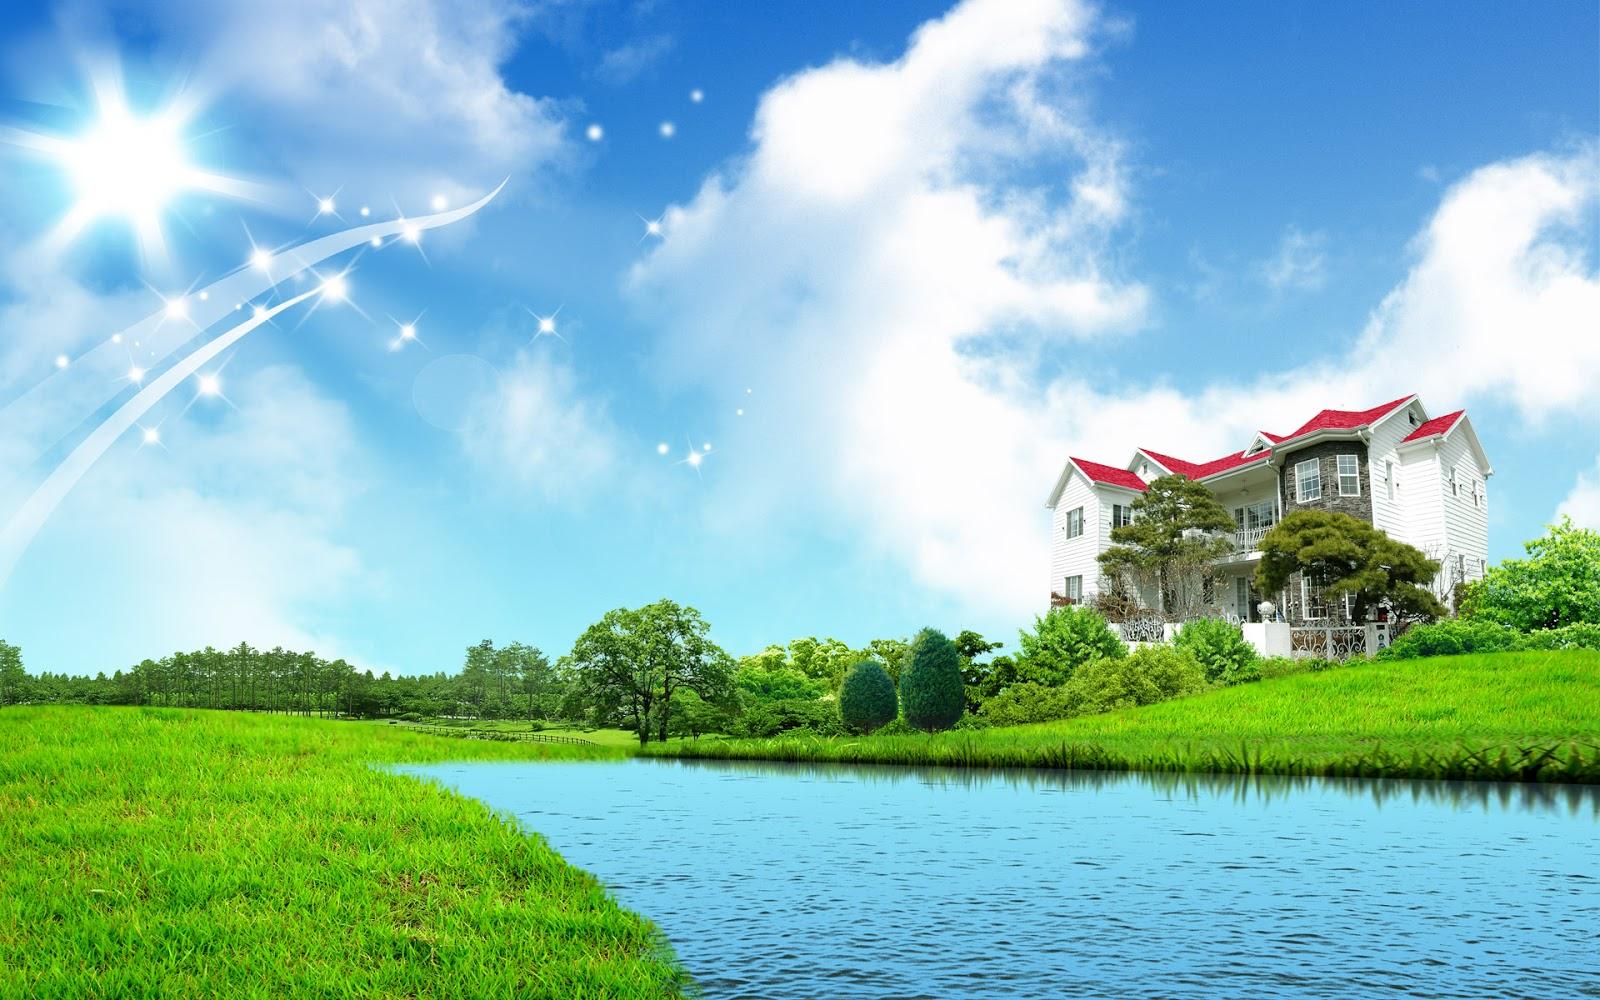 Best Wallpapers Download Free Hd Best Wallpapers Download 23753